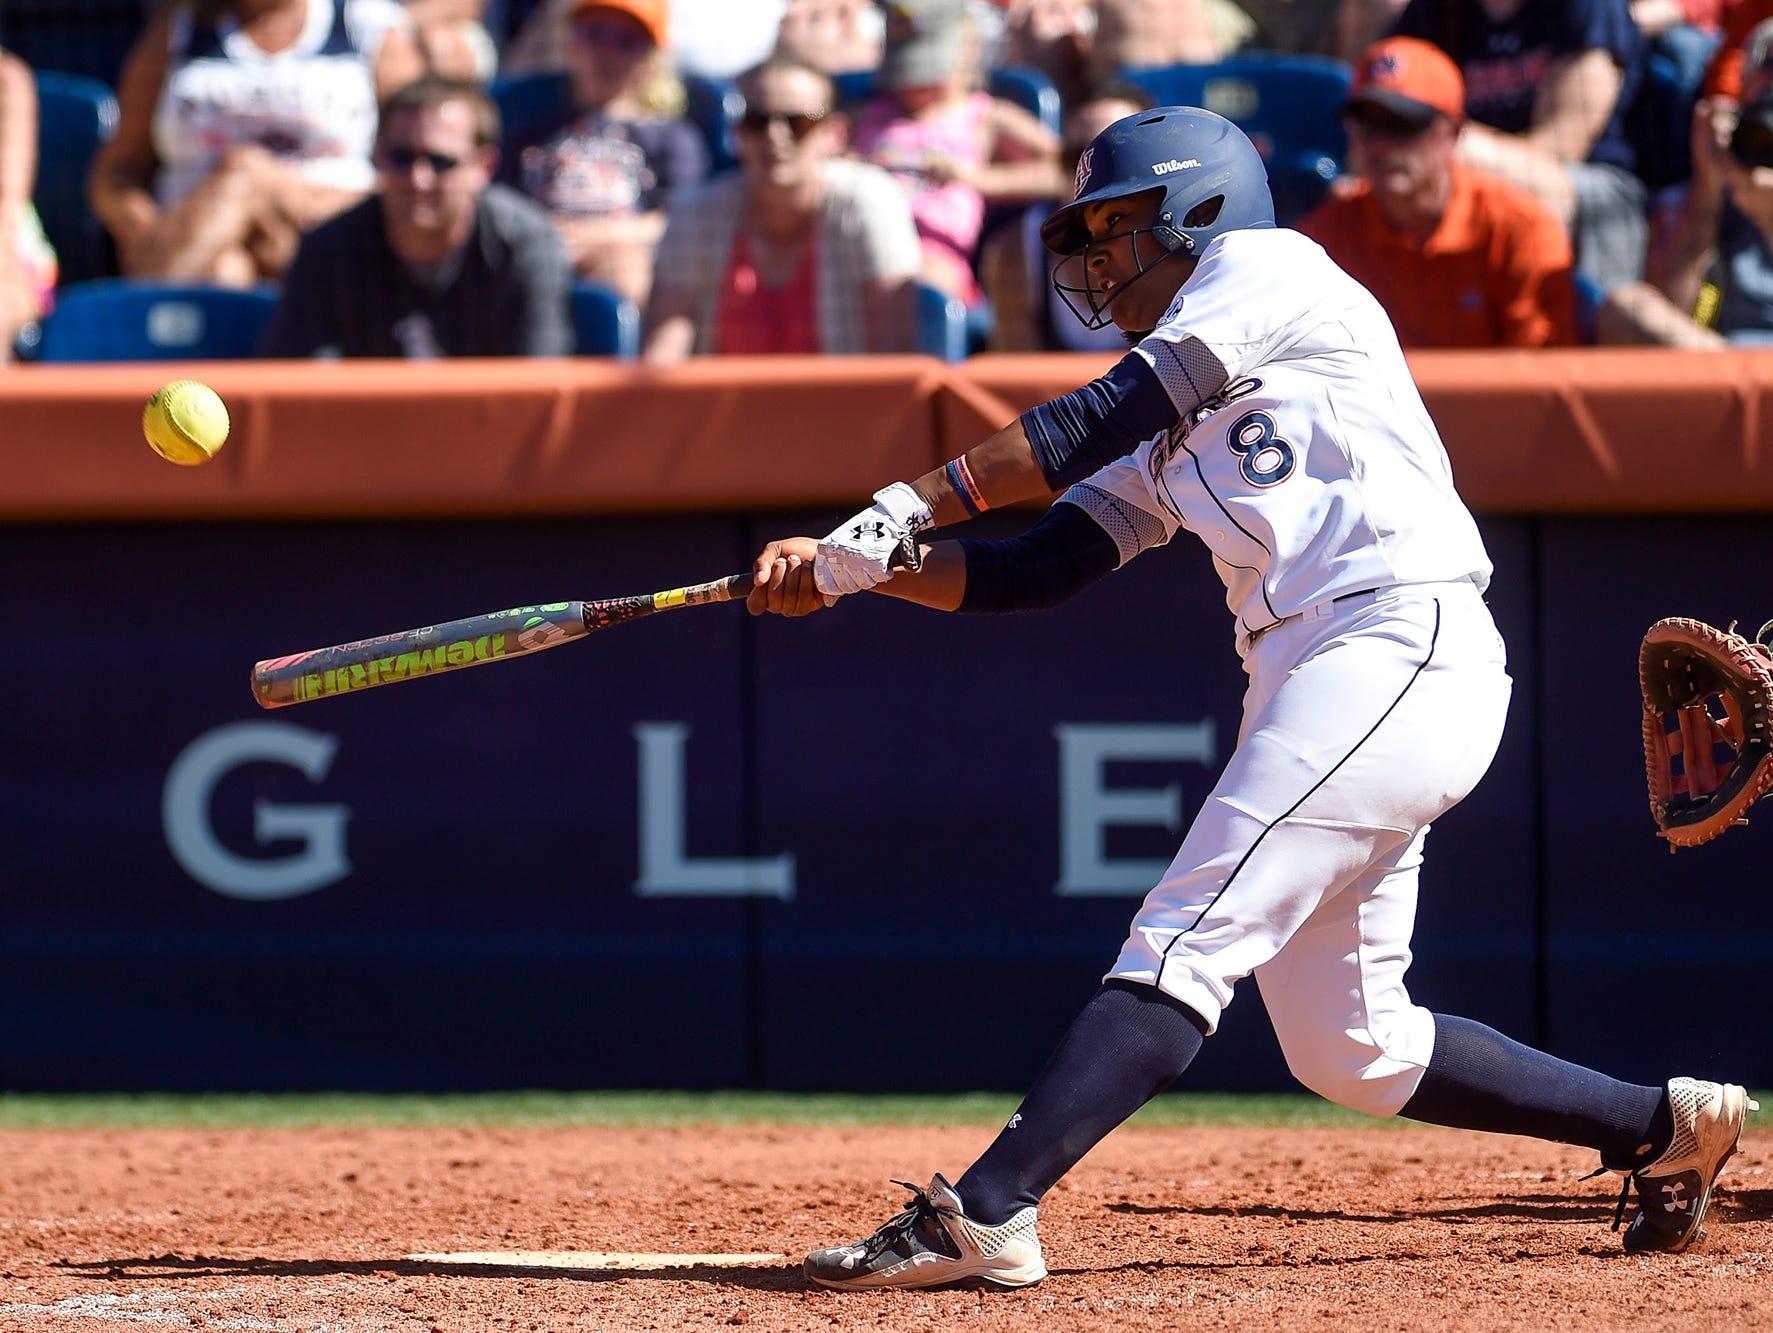 Jade Rhodes (8) hits her 19th home run of the season, sets a new school record. Louisiana-Lafayette vs Auburn: 2015 NCAA Softball Championships: Auburn, Ala. Super Regional on Friday, May 22, 2015. Zach Bland/Auburn Athletics